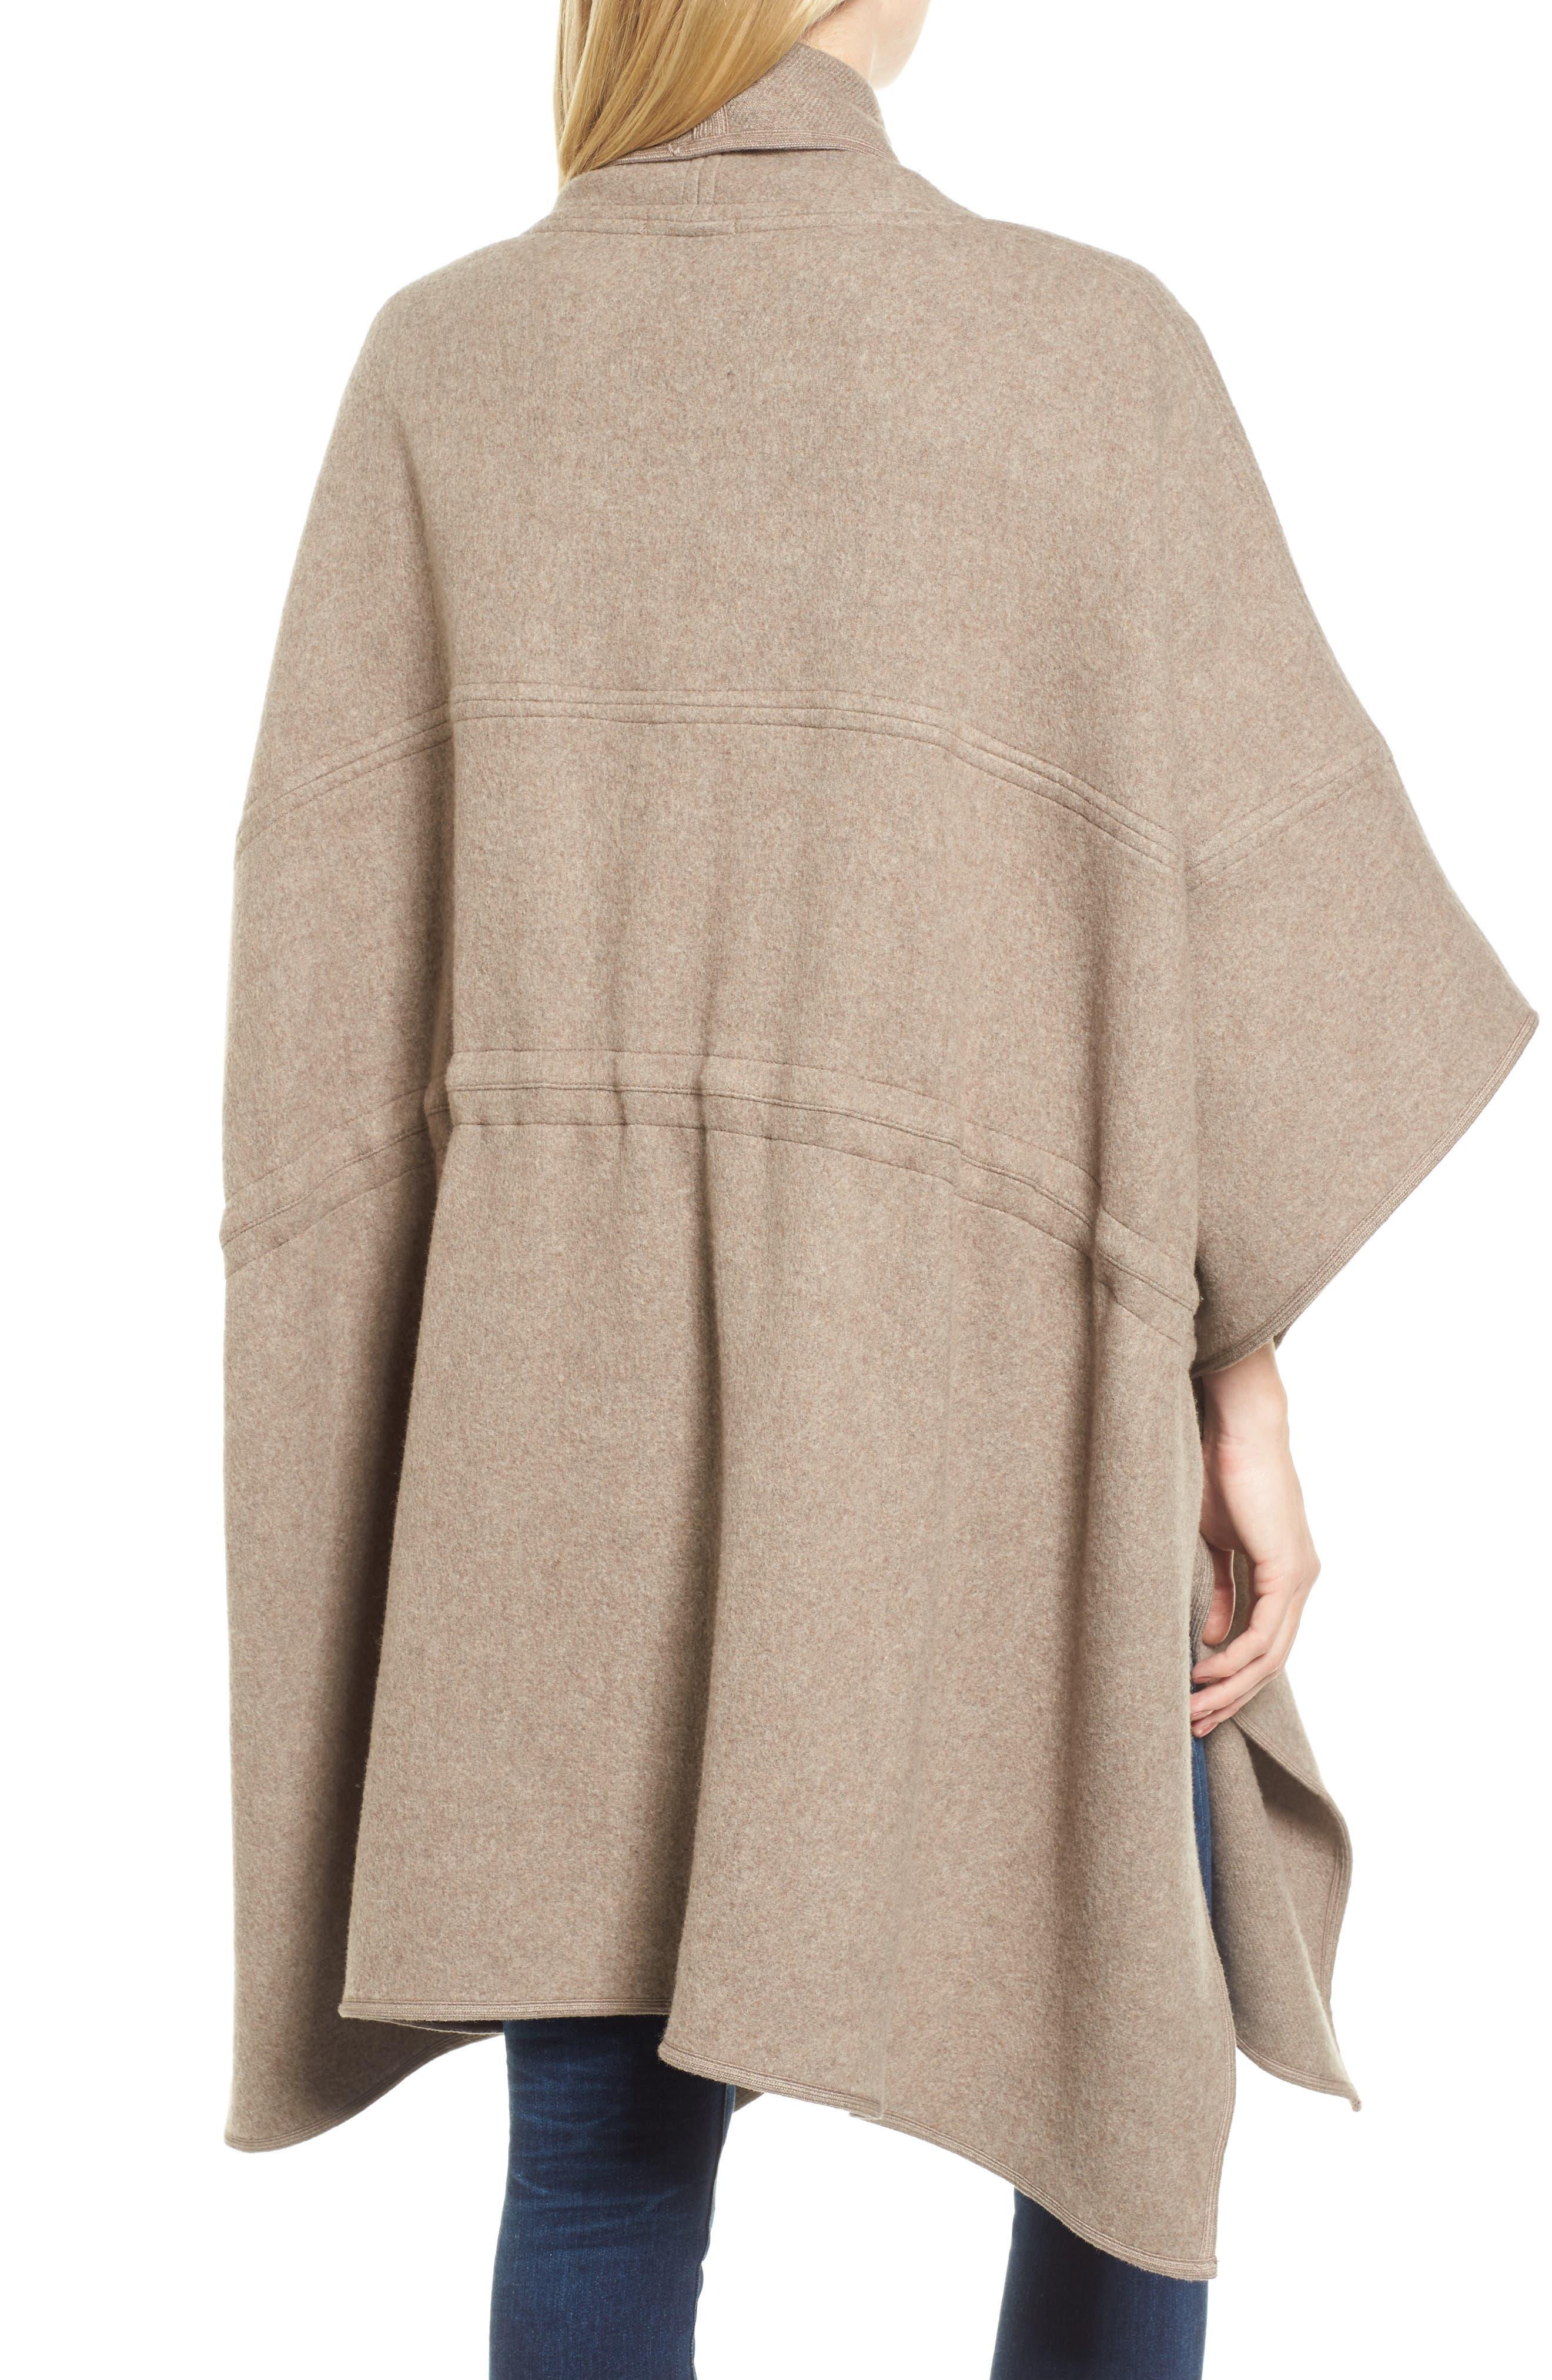 Nomad Blanket Coat,                             Alternate thumbnail 2, color,                             243